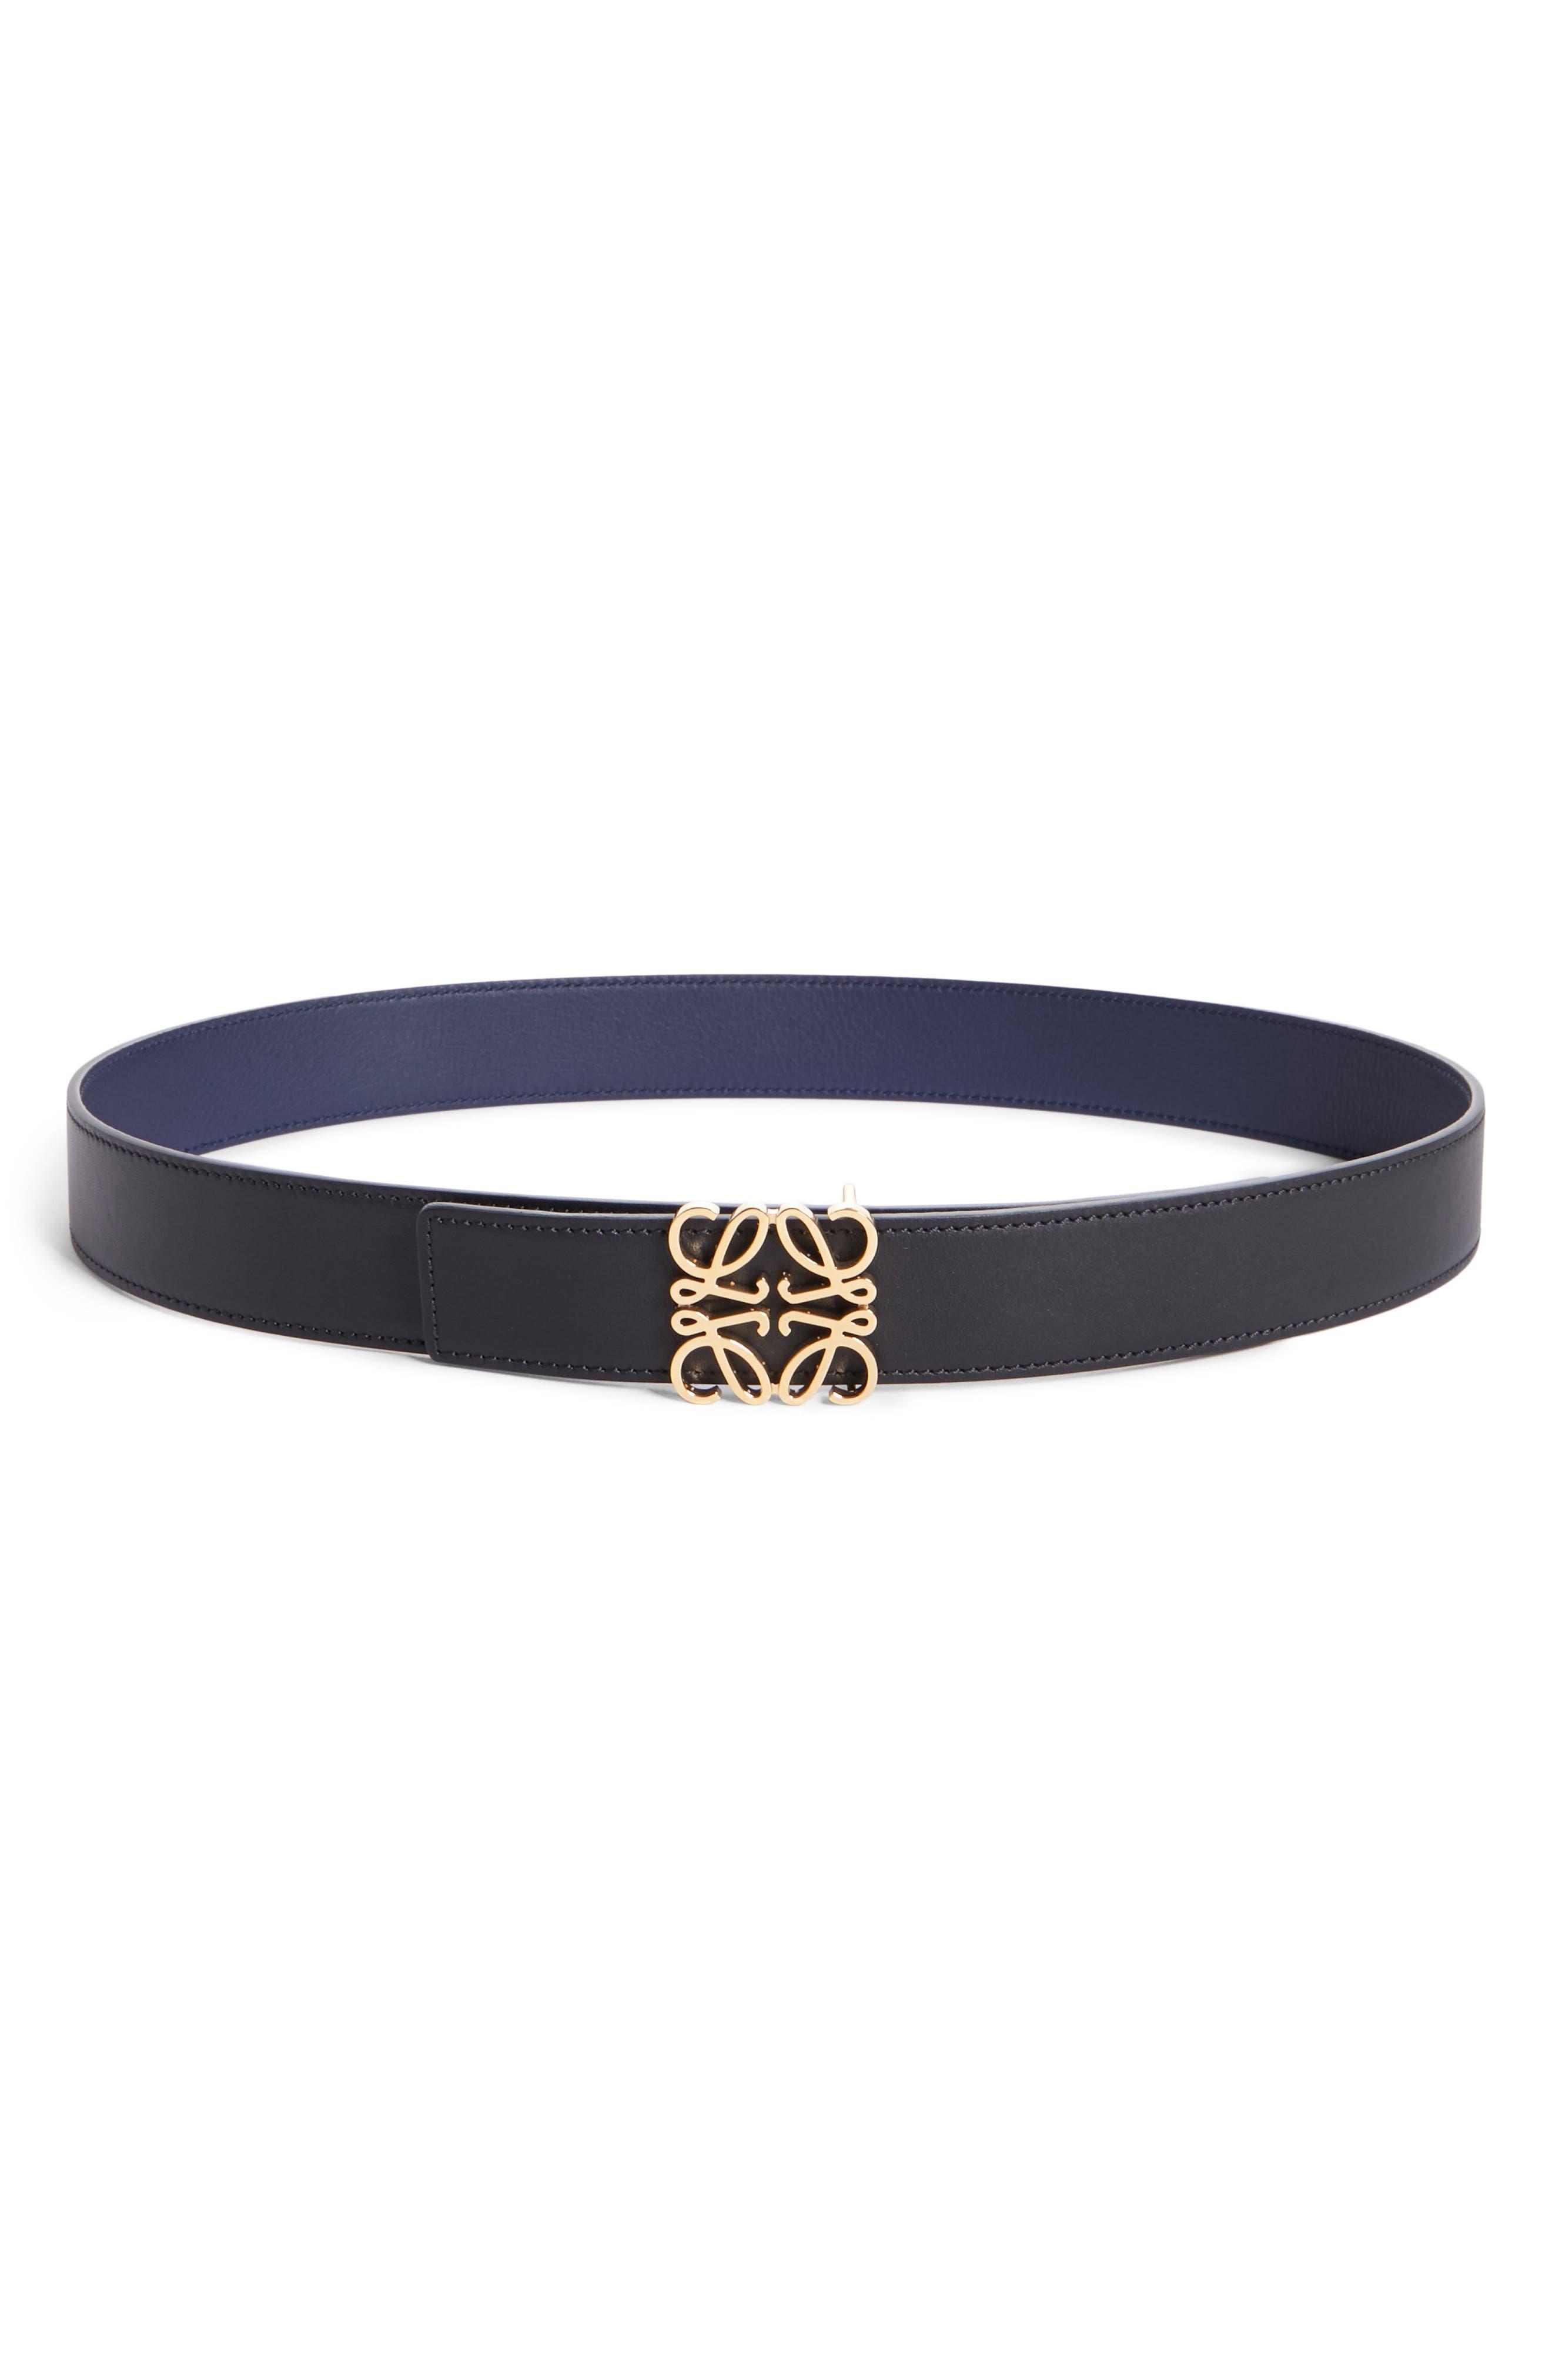 Loewe Anagram Logo Calfskin Leather Belt, Black/ Gold/ Navy